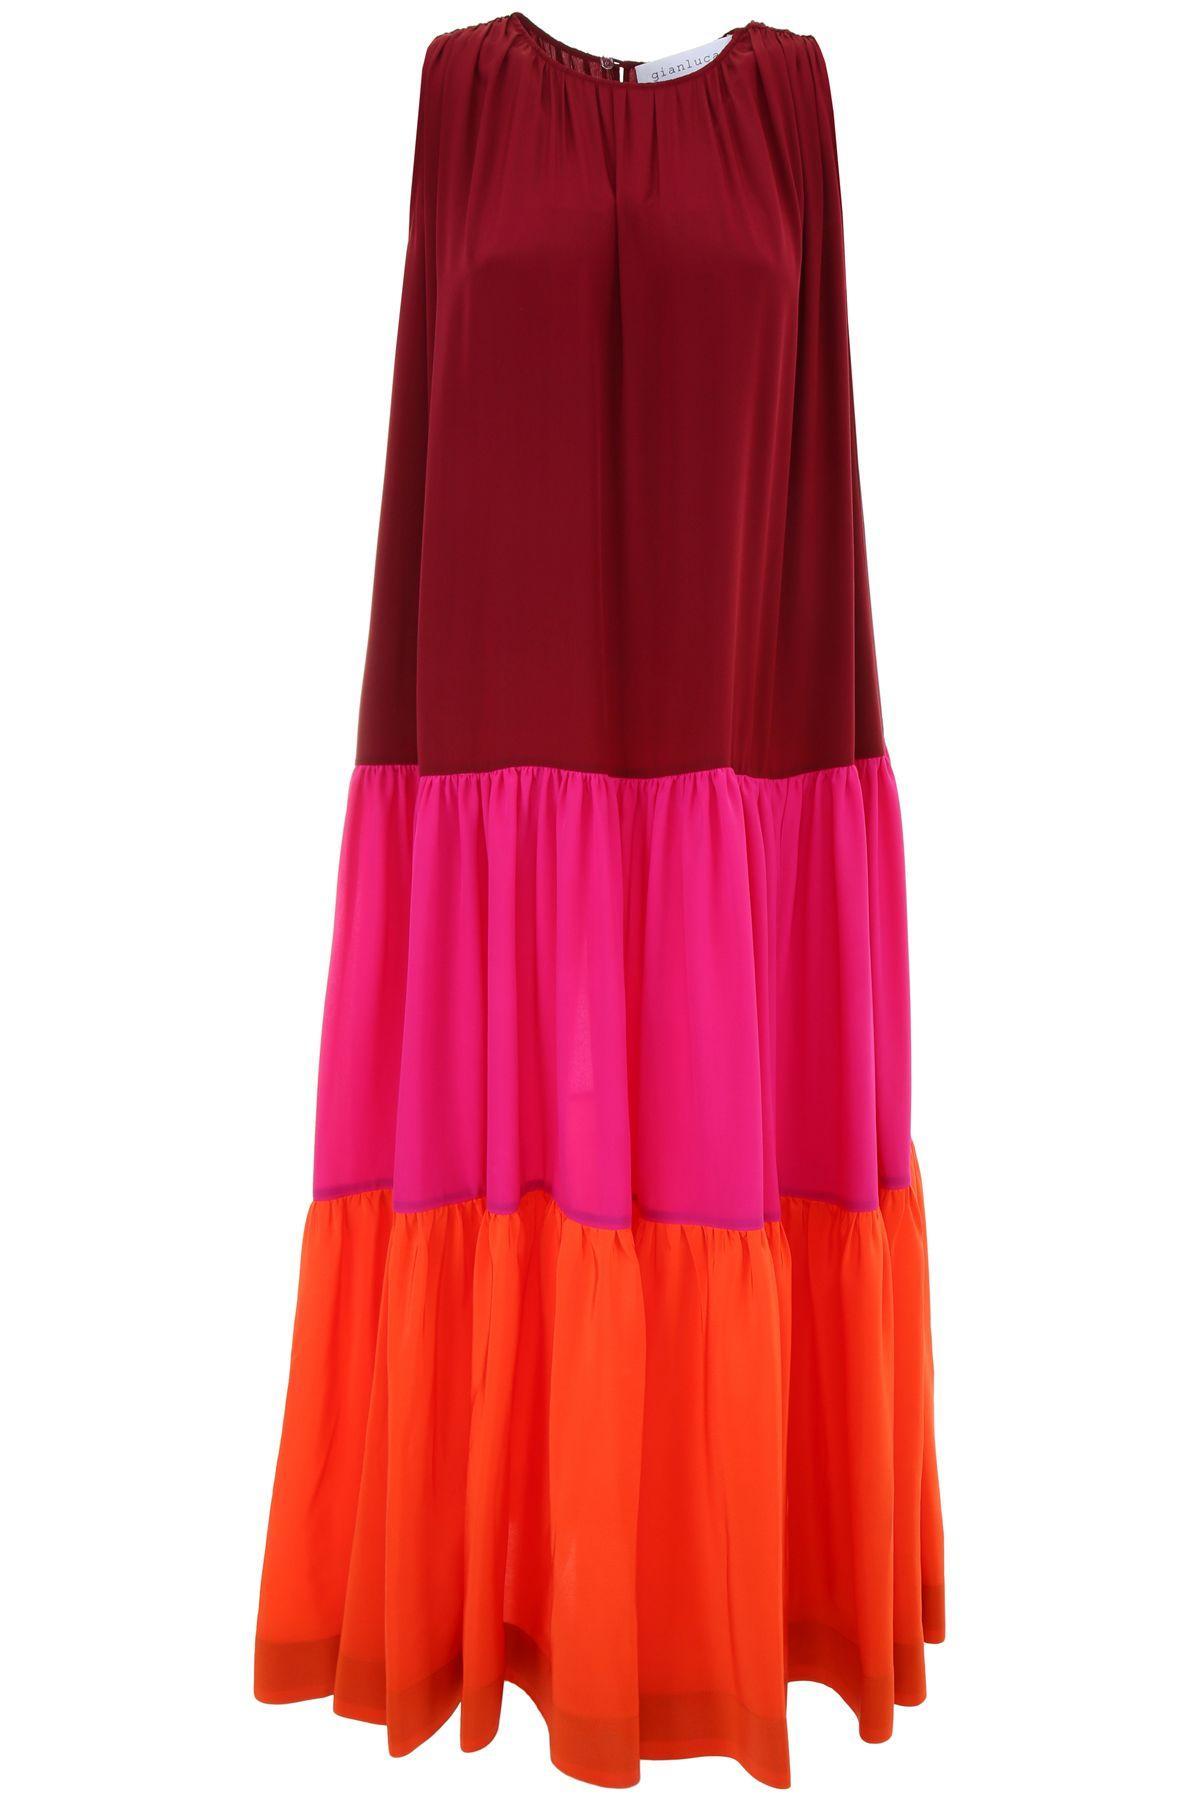 Gianluca Capannolo Long Martha Dress In Burgundy+fuxia+orangerosso